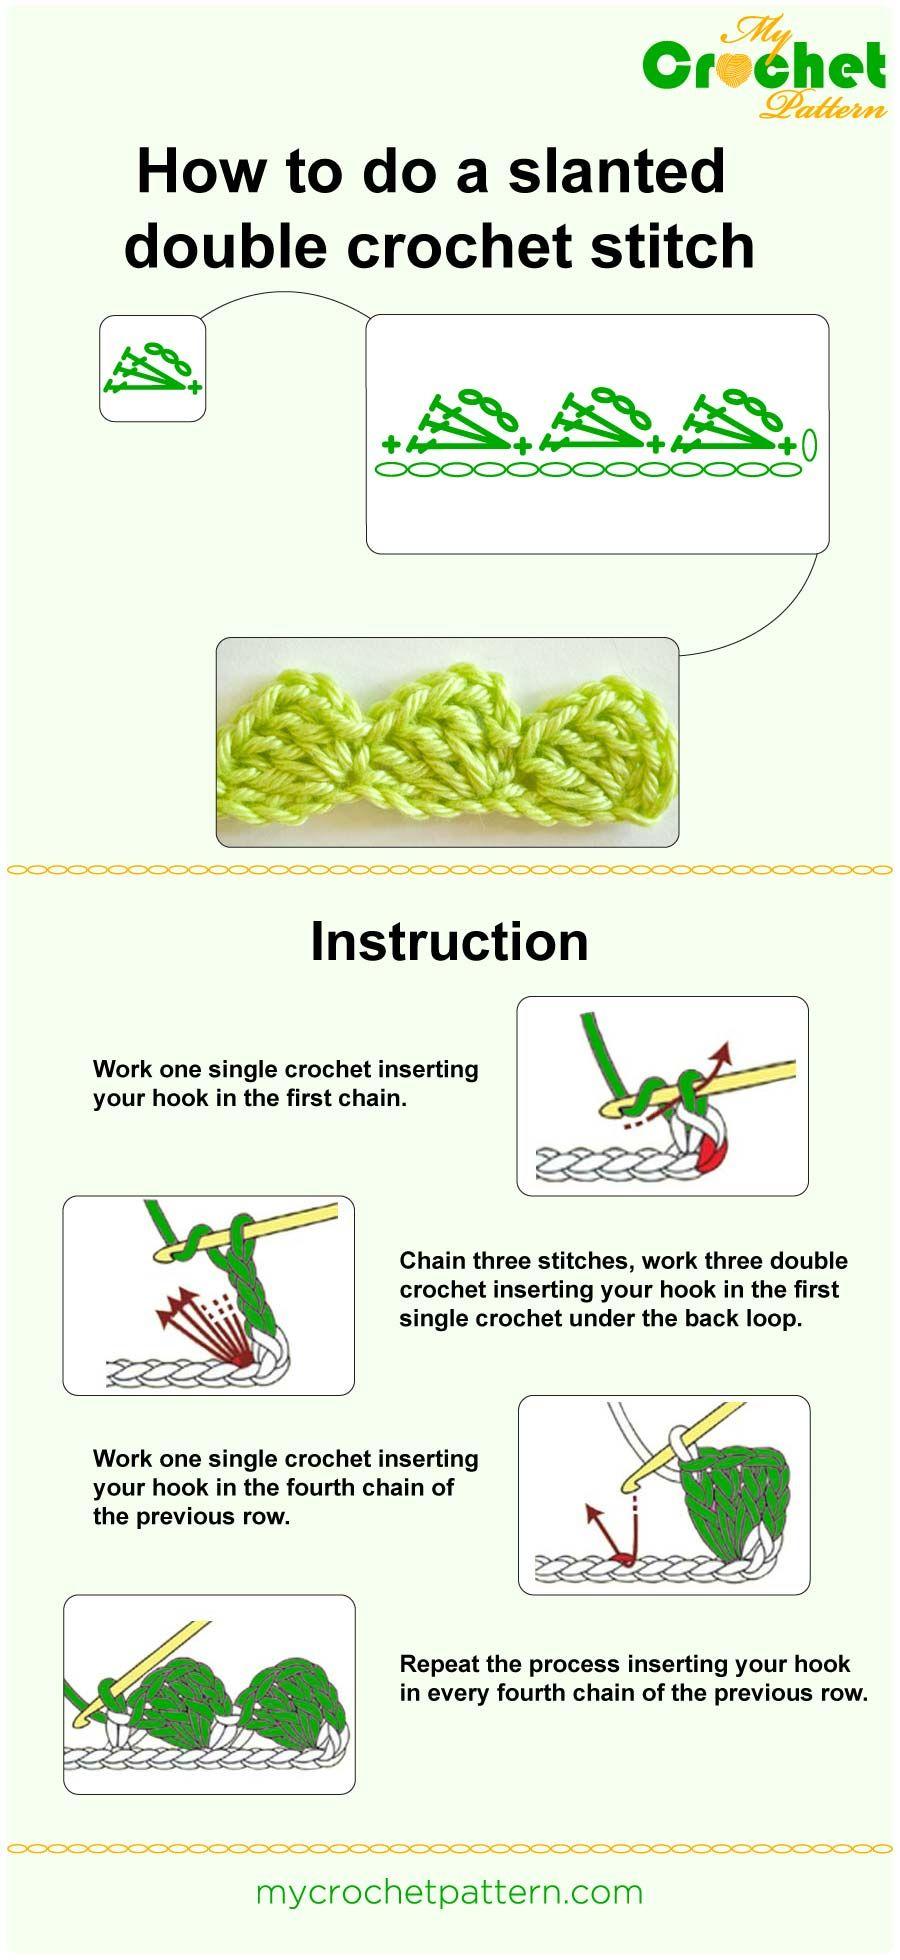 Slanted double crochet stitch tutorial | crochet | Pinterest ...